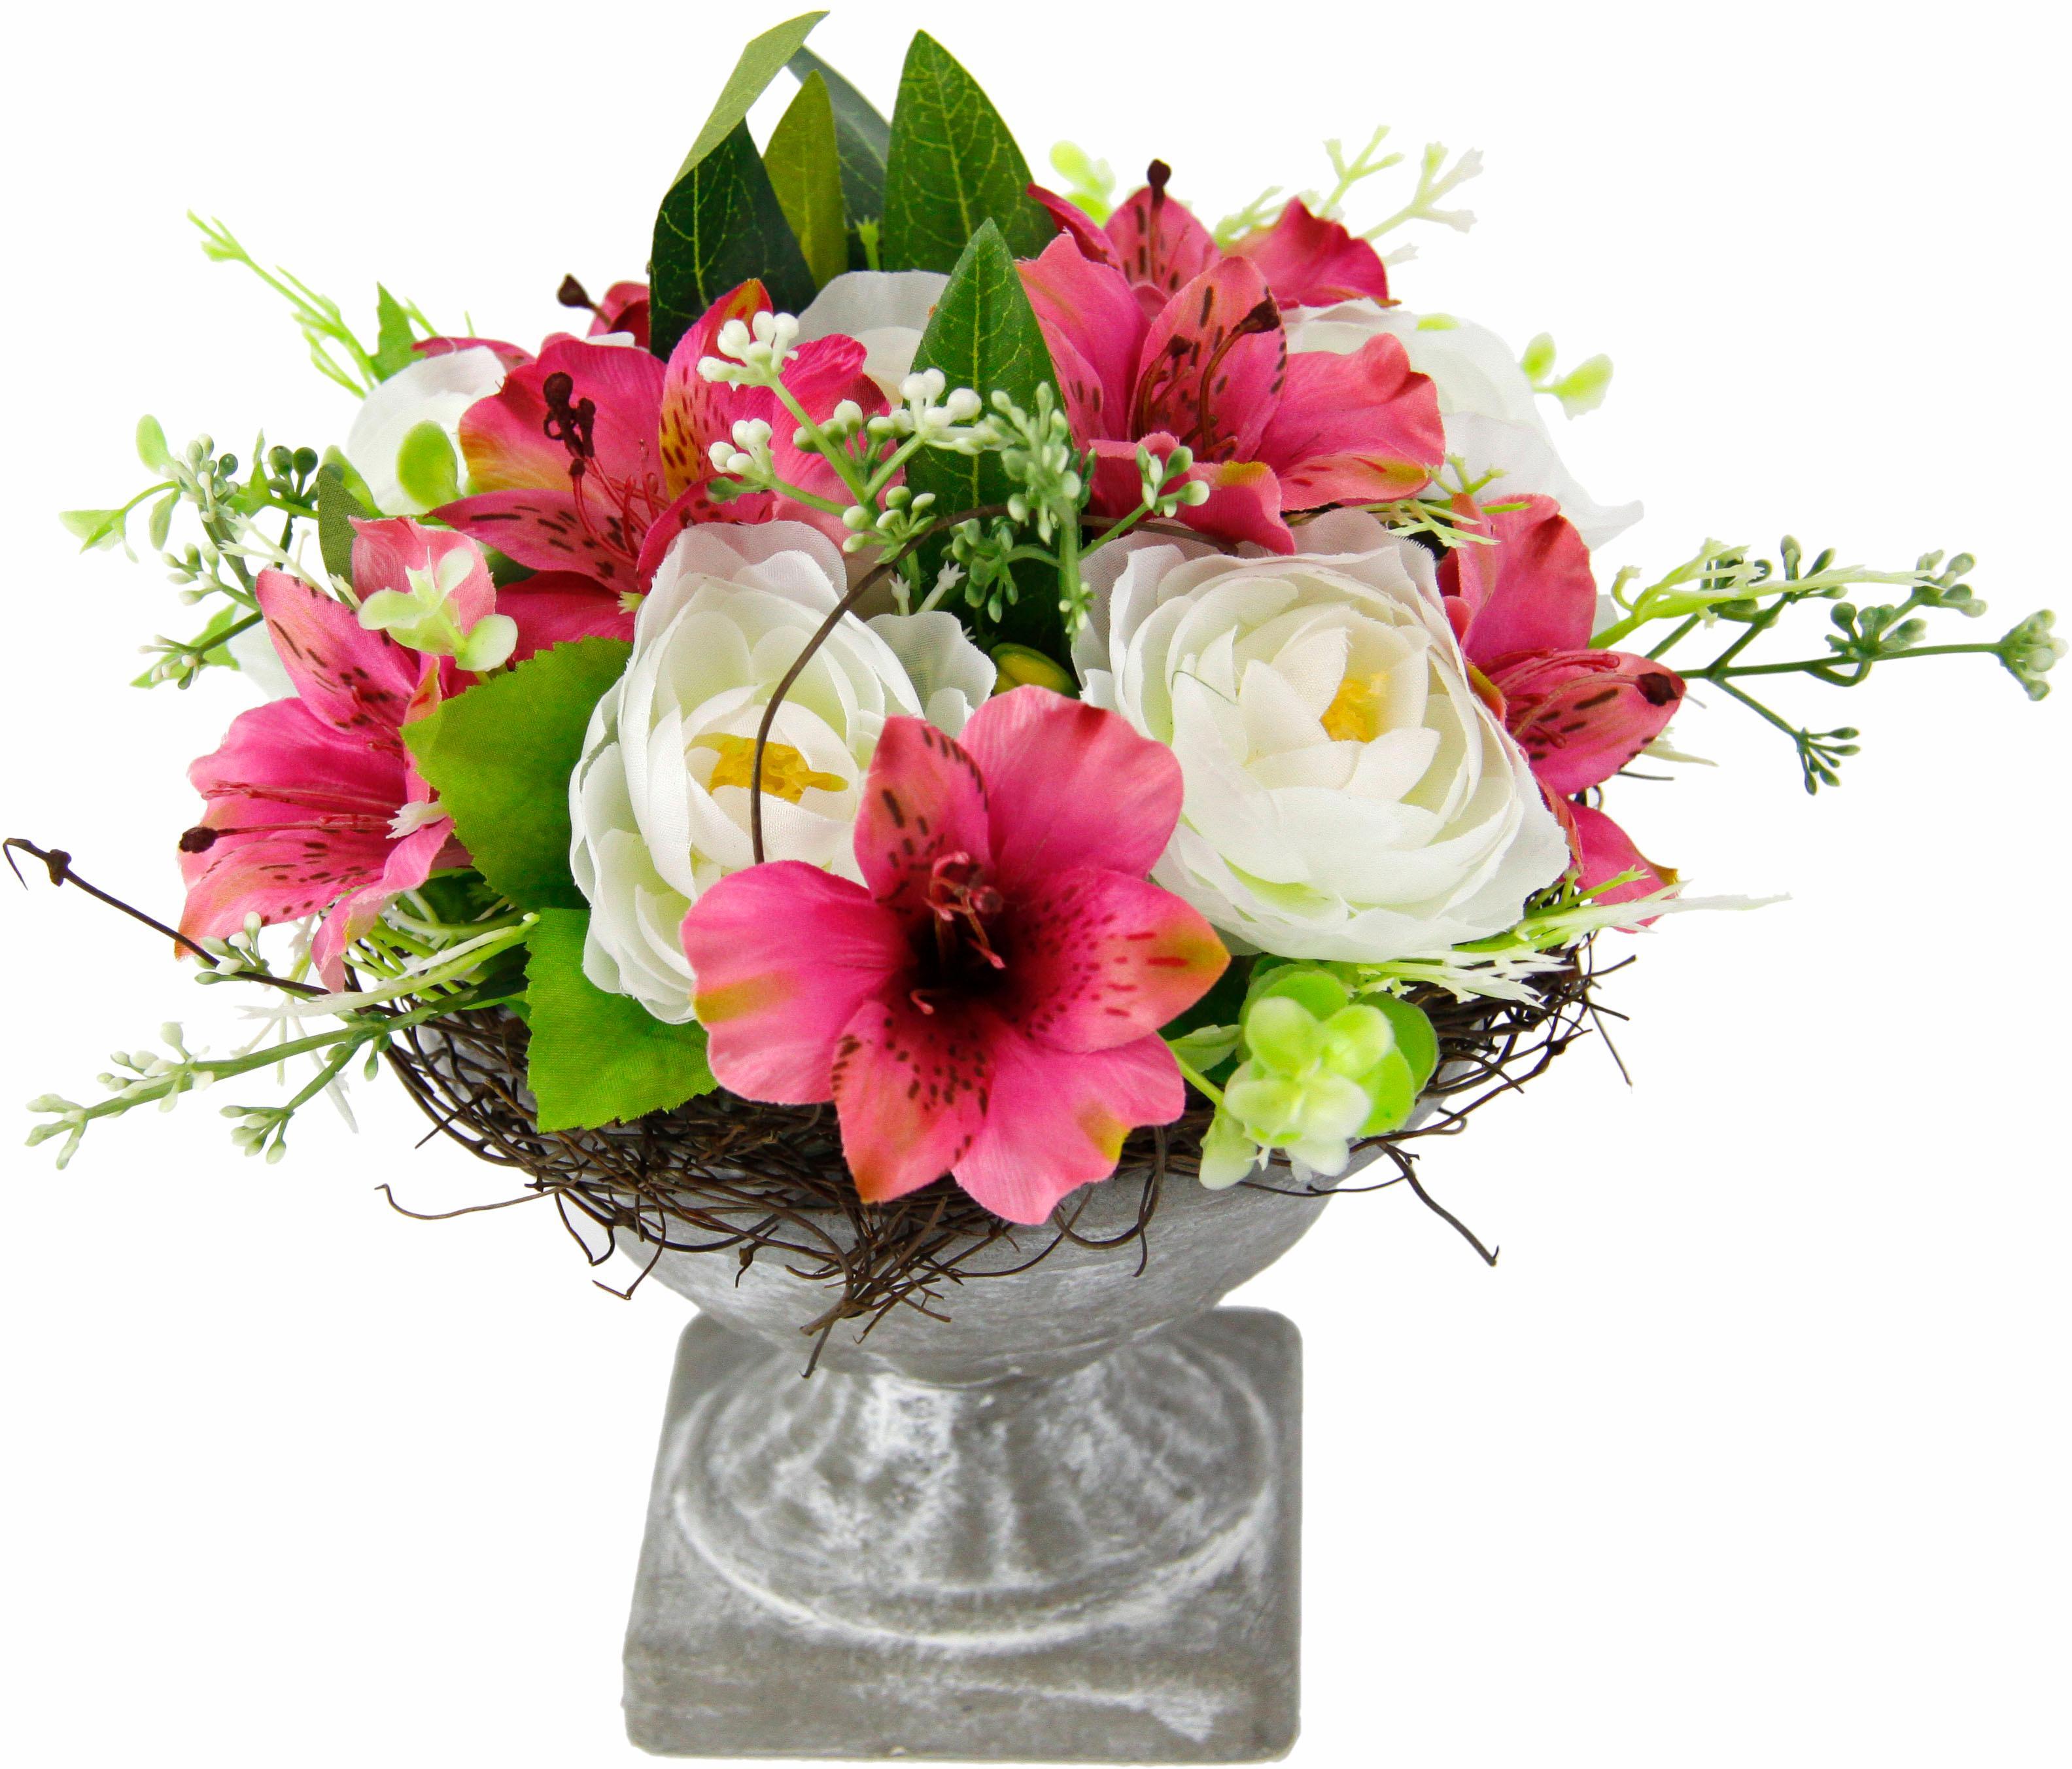 Kunstpflanze Gesteck Ranunkel in Pokal   Dekoration > Dekopflanzen > Kunstpflanzen   Rosa